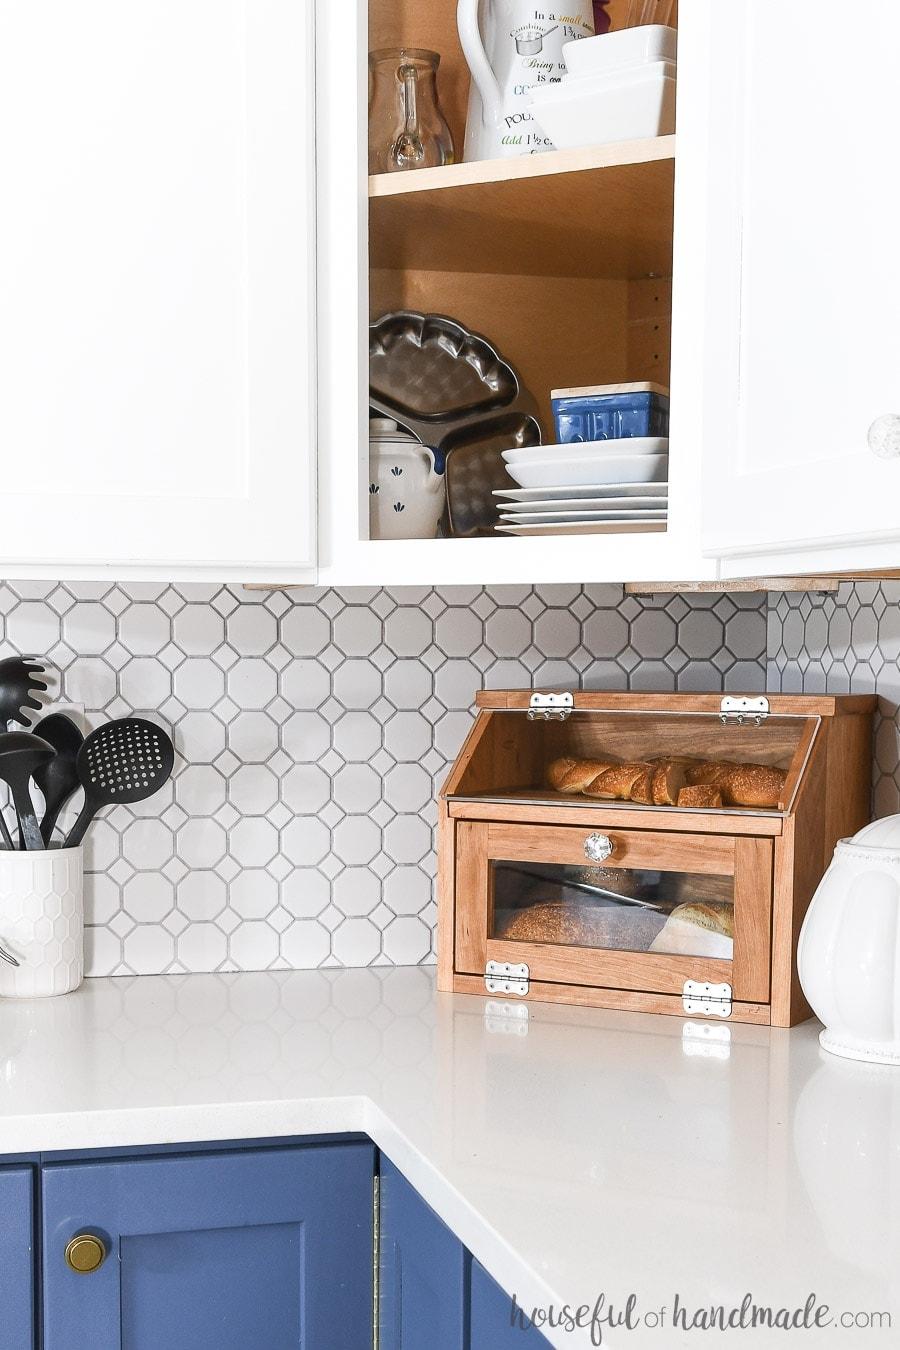 DIY bread box in the corner of a kitchen counter.